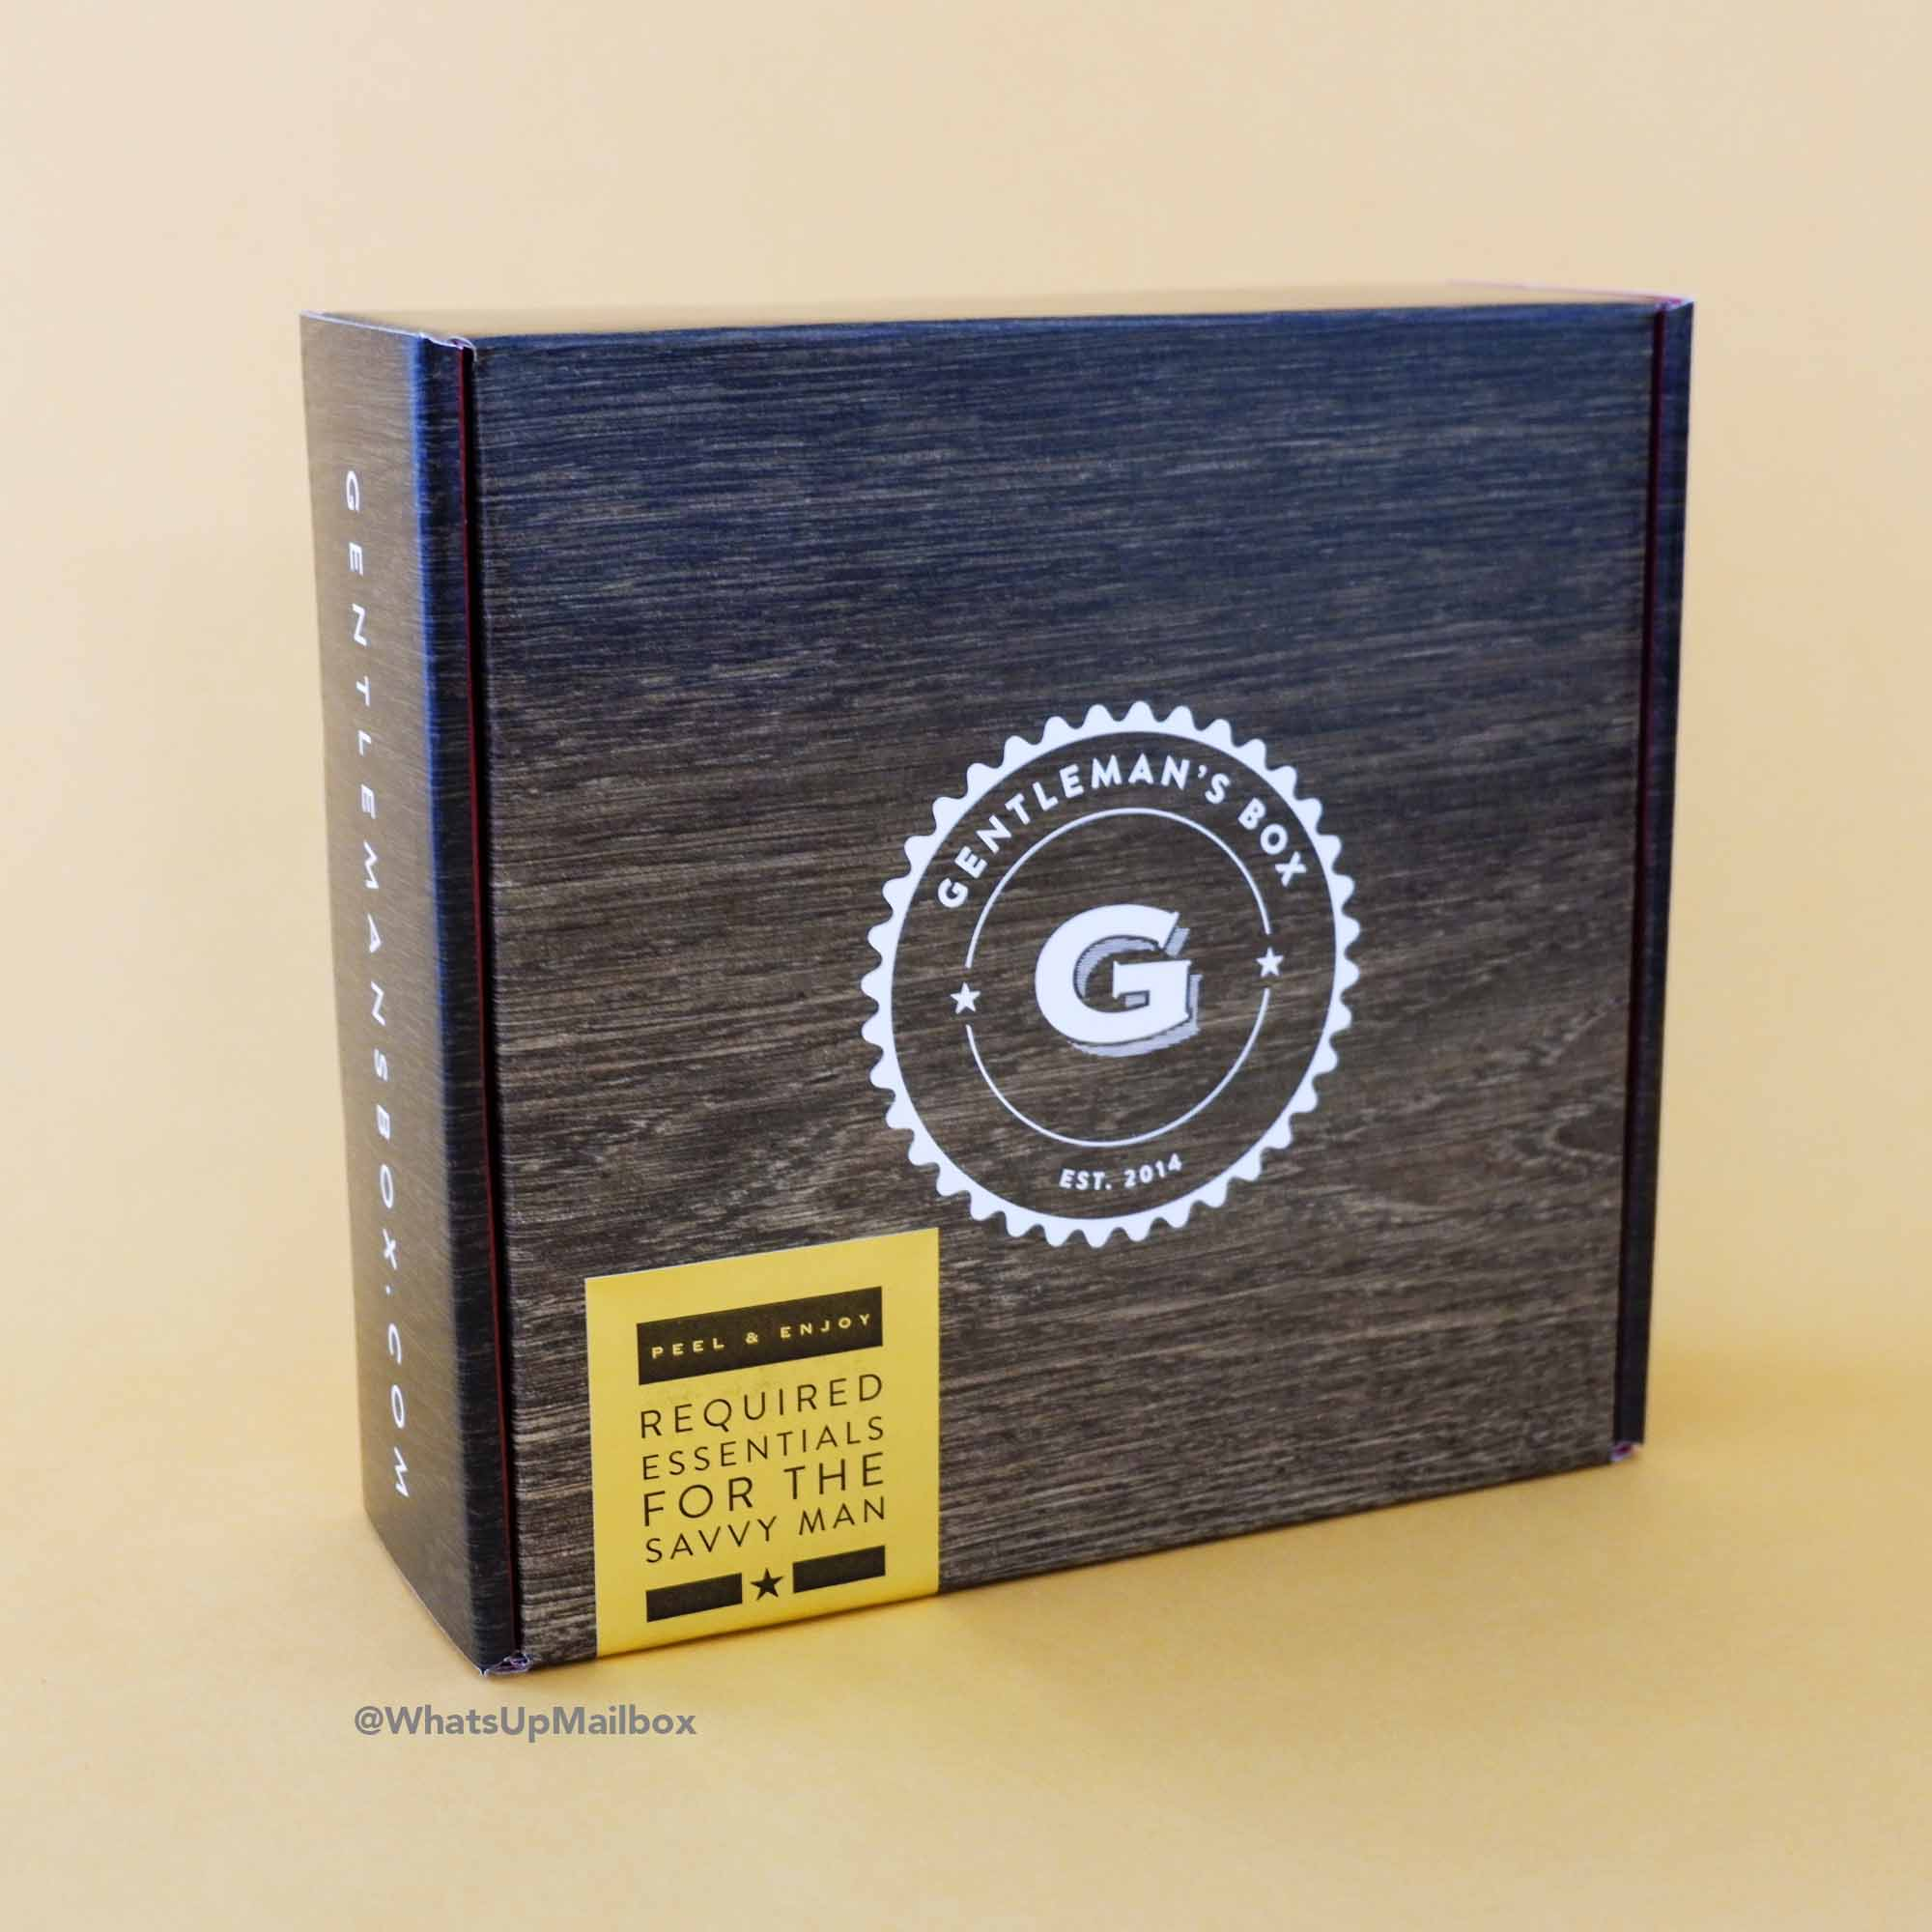 Gentleman's Box February 2017 Box